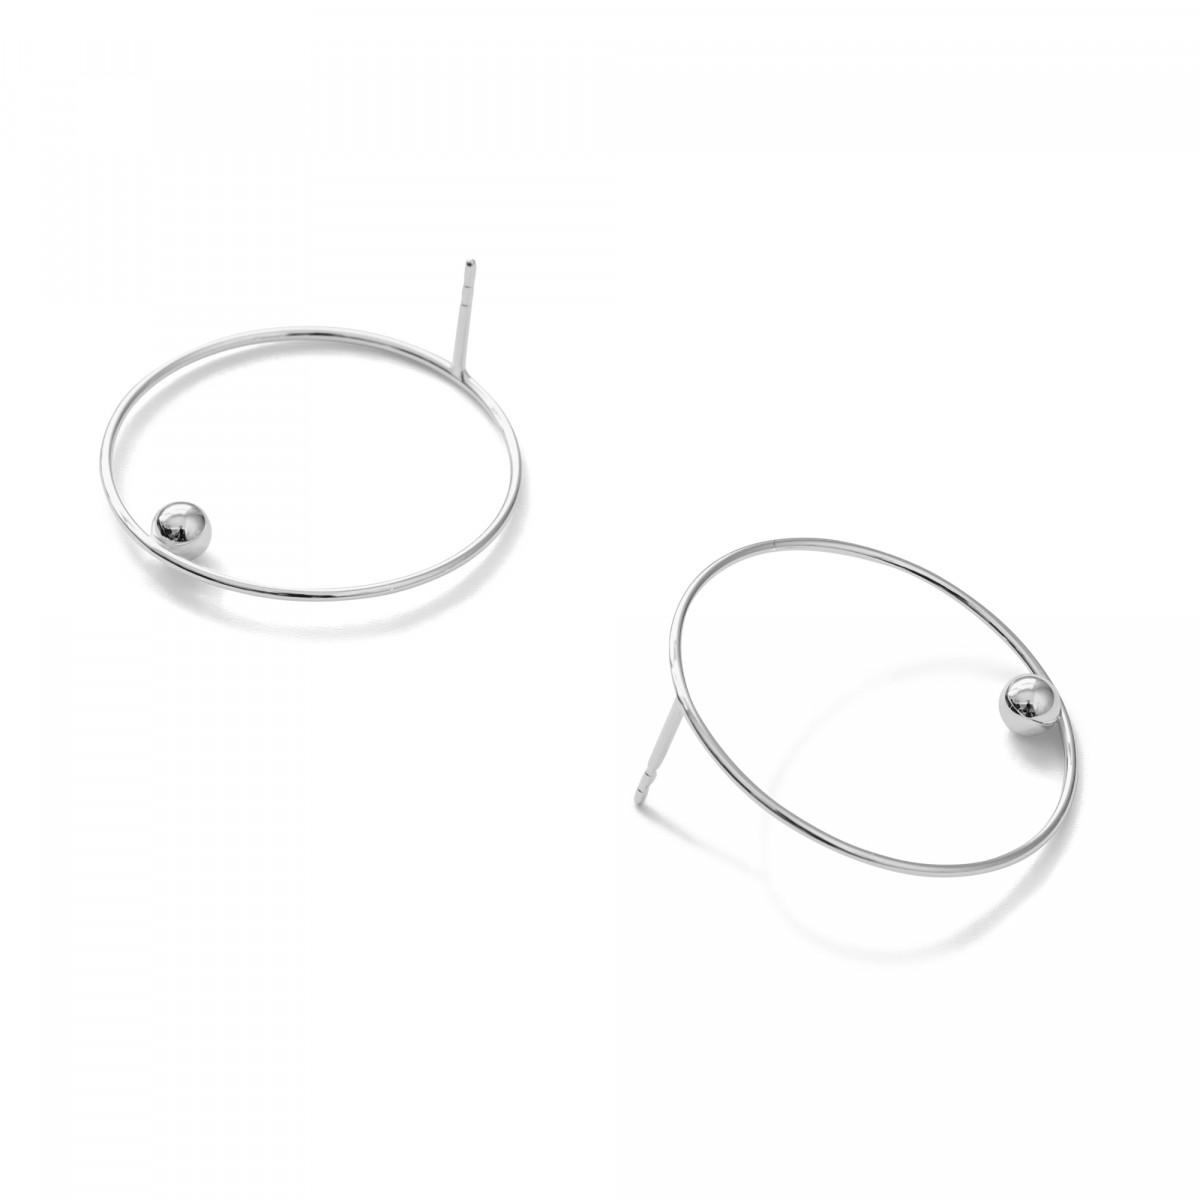 Jonathan Radetz Jewellery, Stecker EFFECT 30, Silber 925, Sterlingsilber, Durchmesser 30 mm, Handmade in Germany